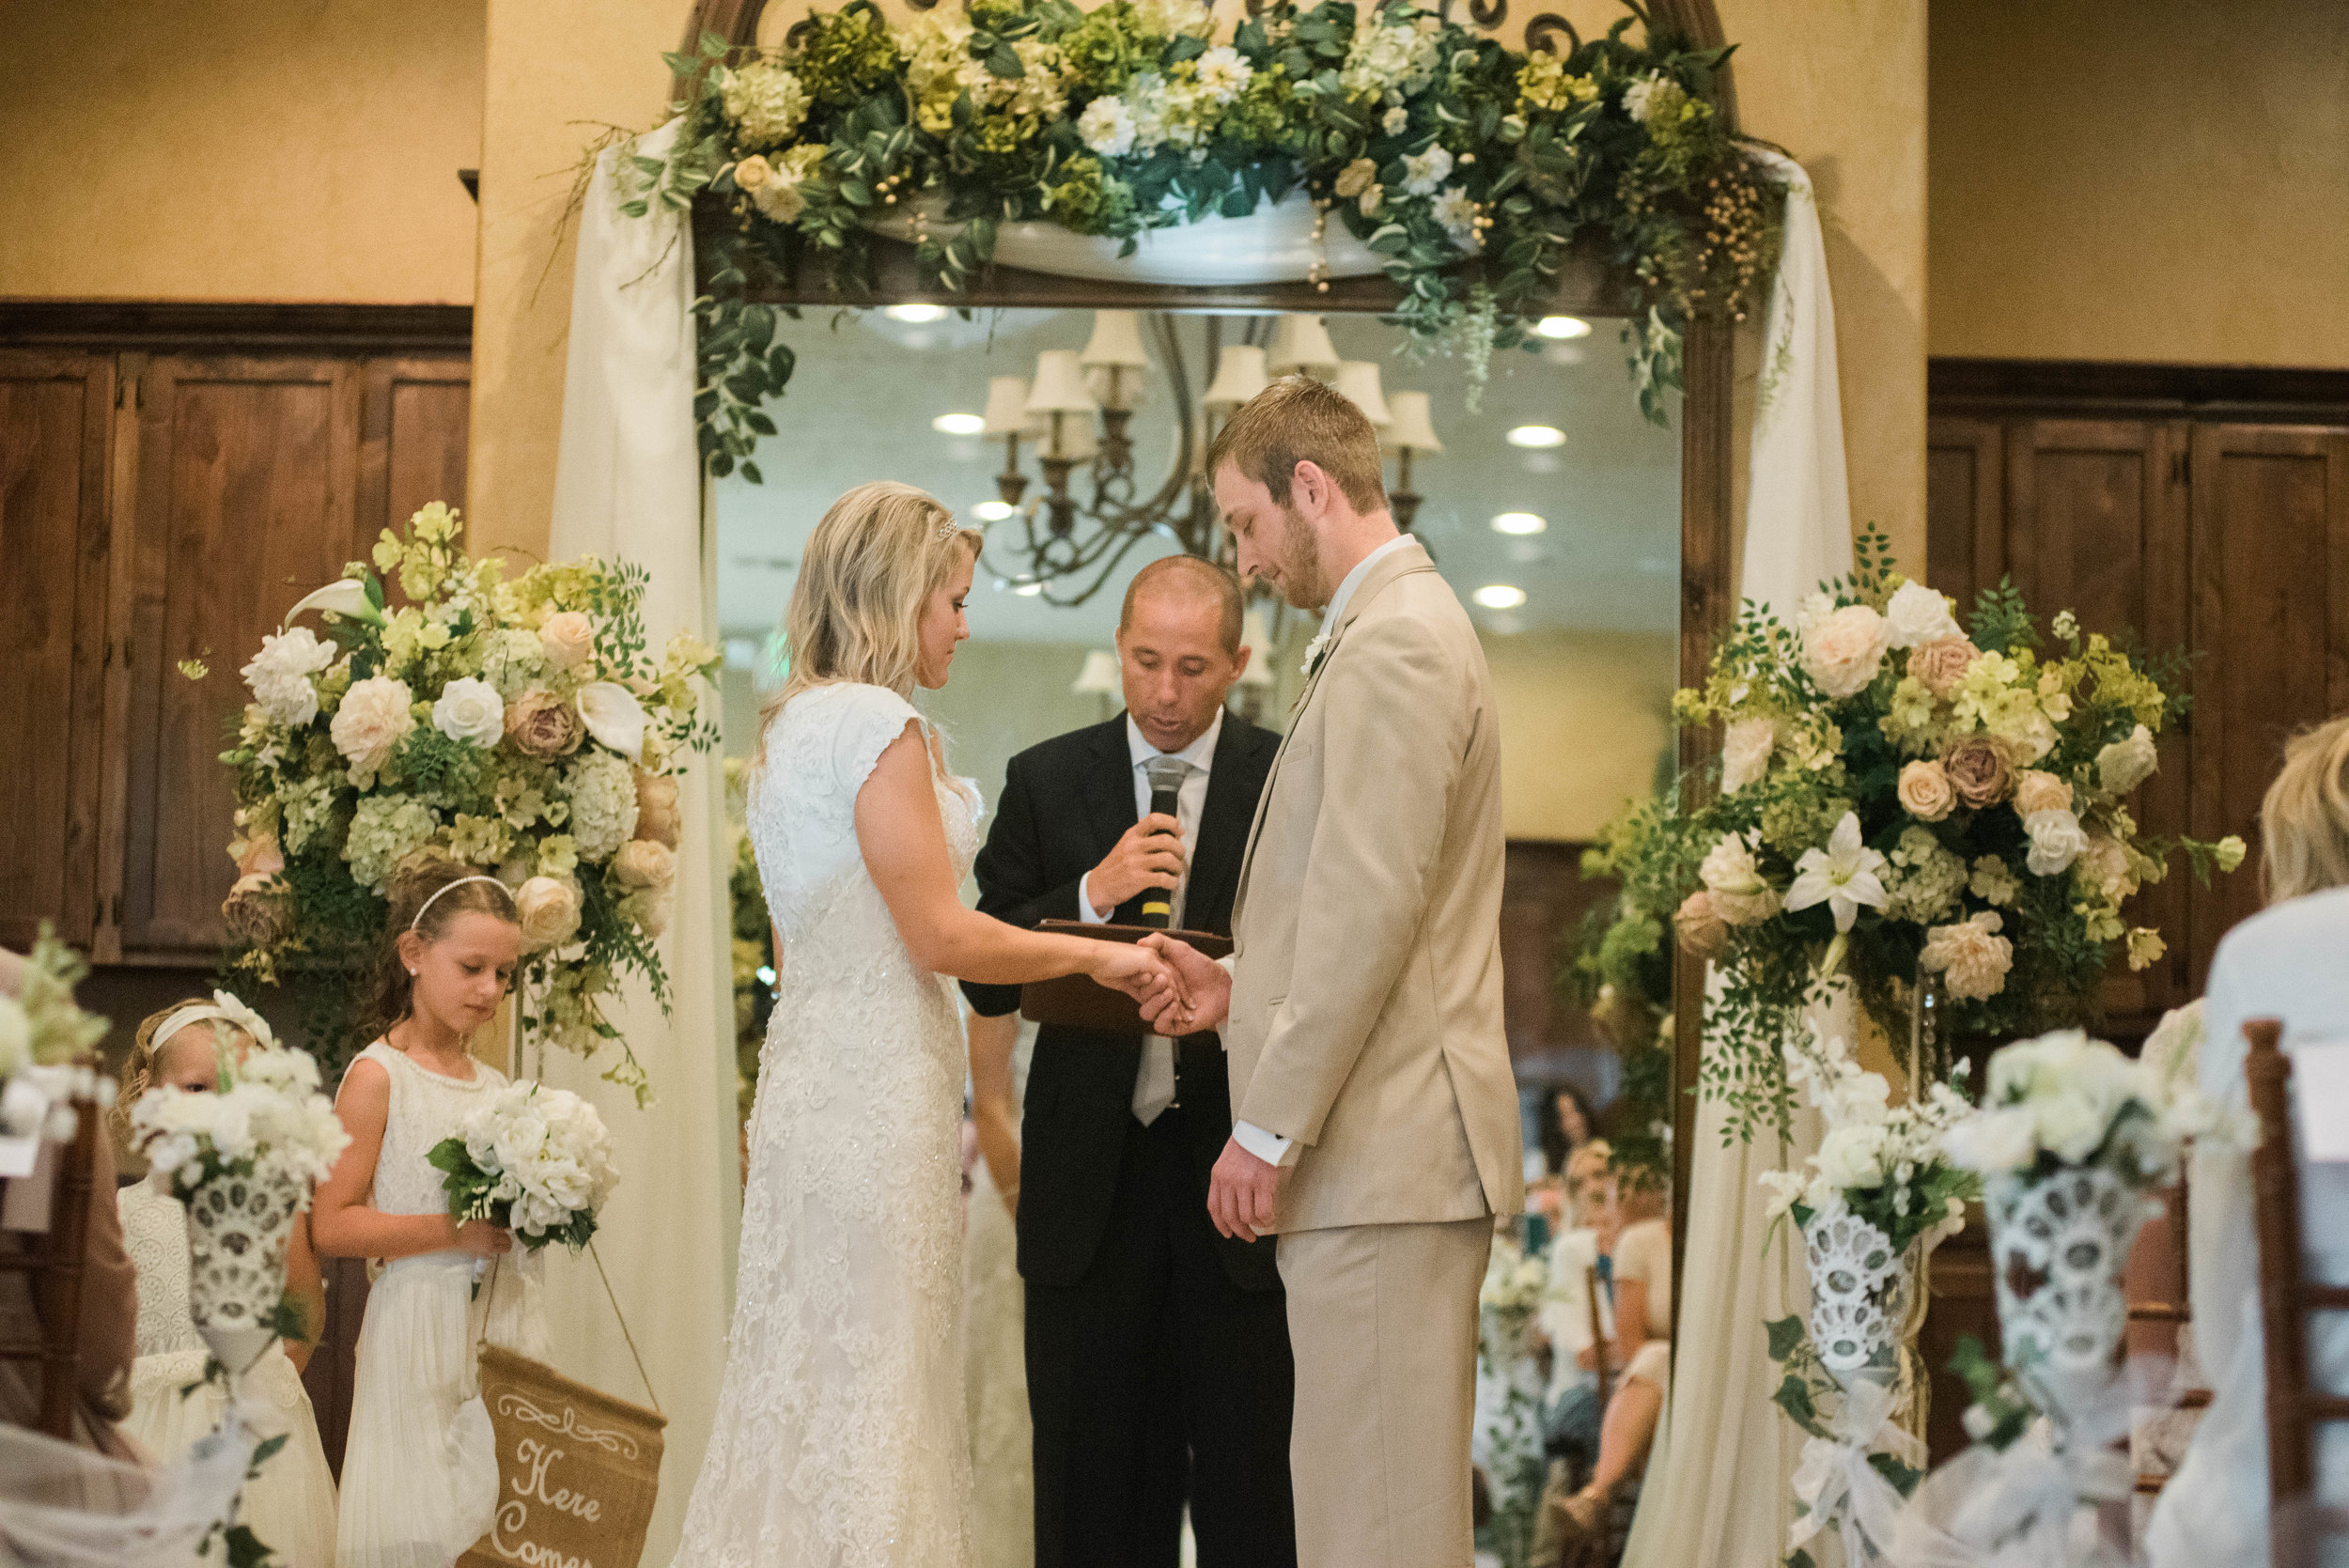 DANIEL+LACI-WEDDING-Sadie_Banks_Photography-213.jpg